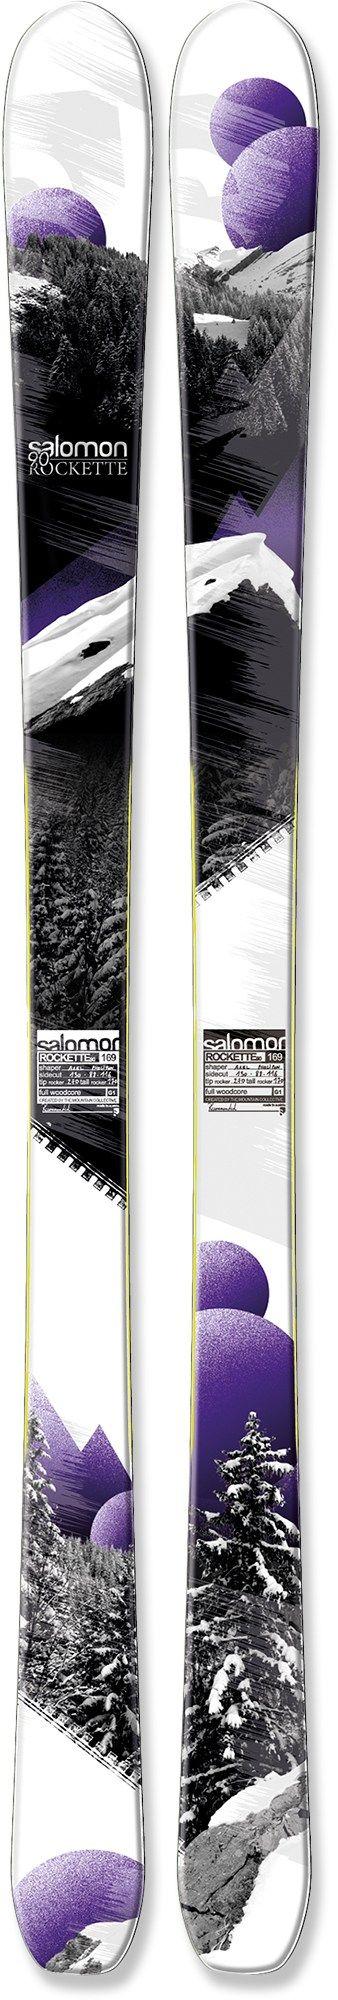 Salomon Rockette 90 Skis - Women's - 2012/2103 - Free Shipping at REI.com